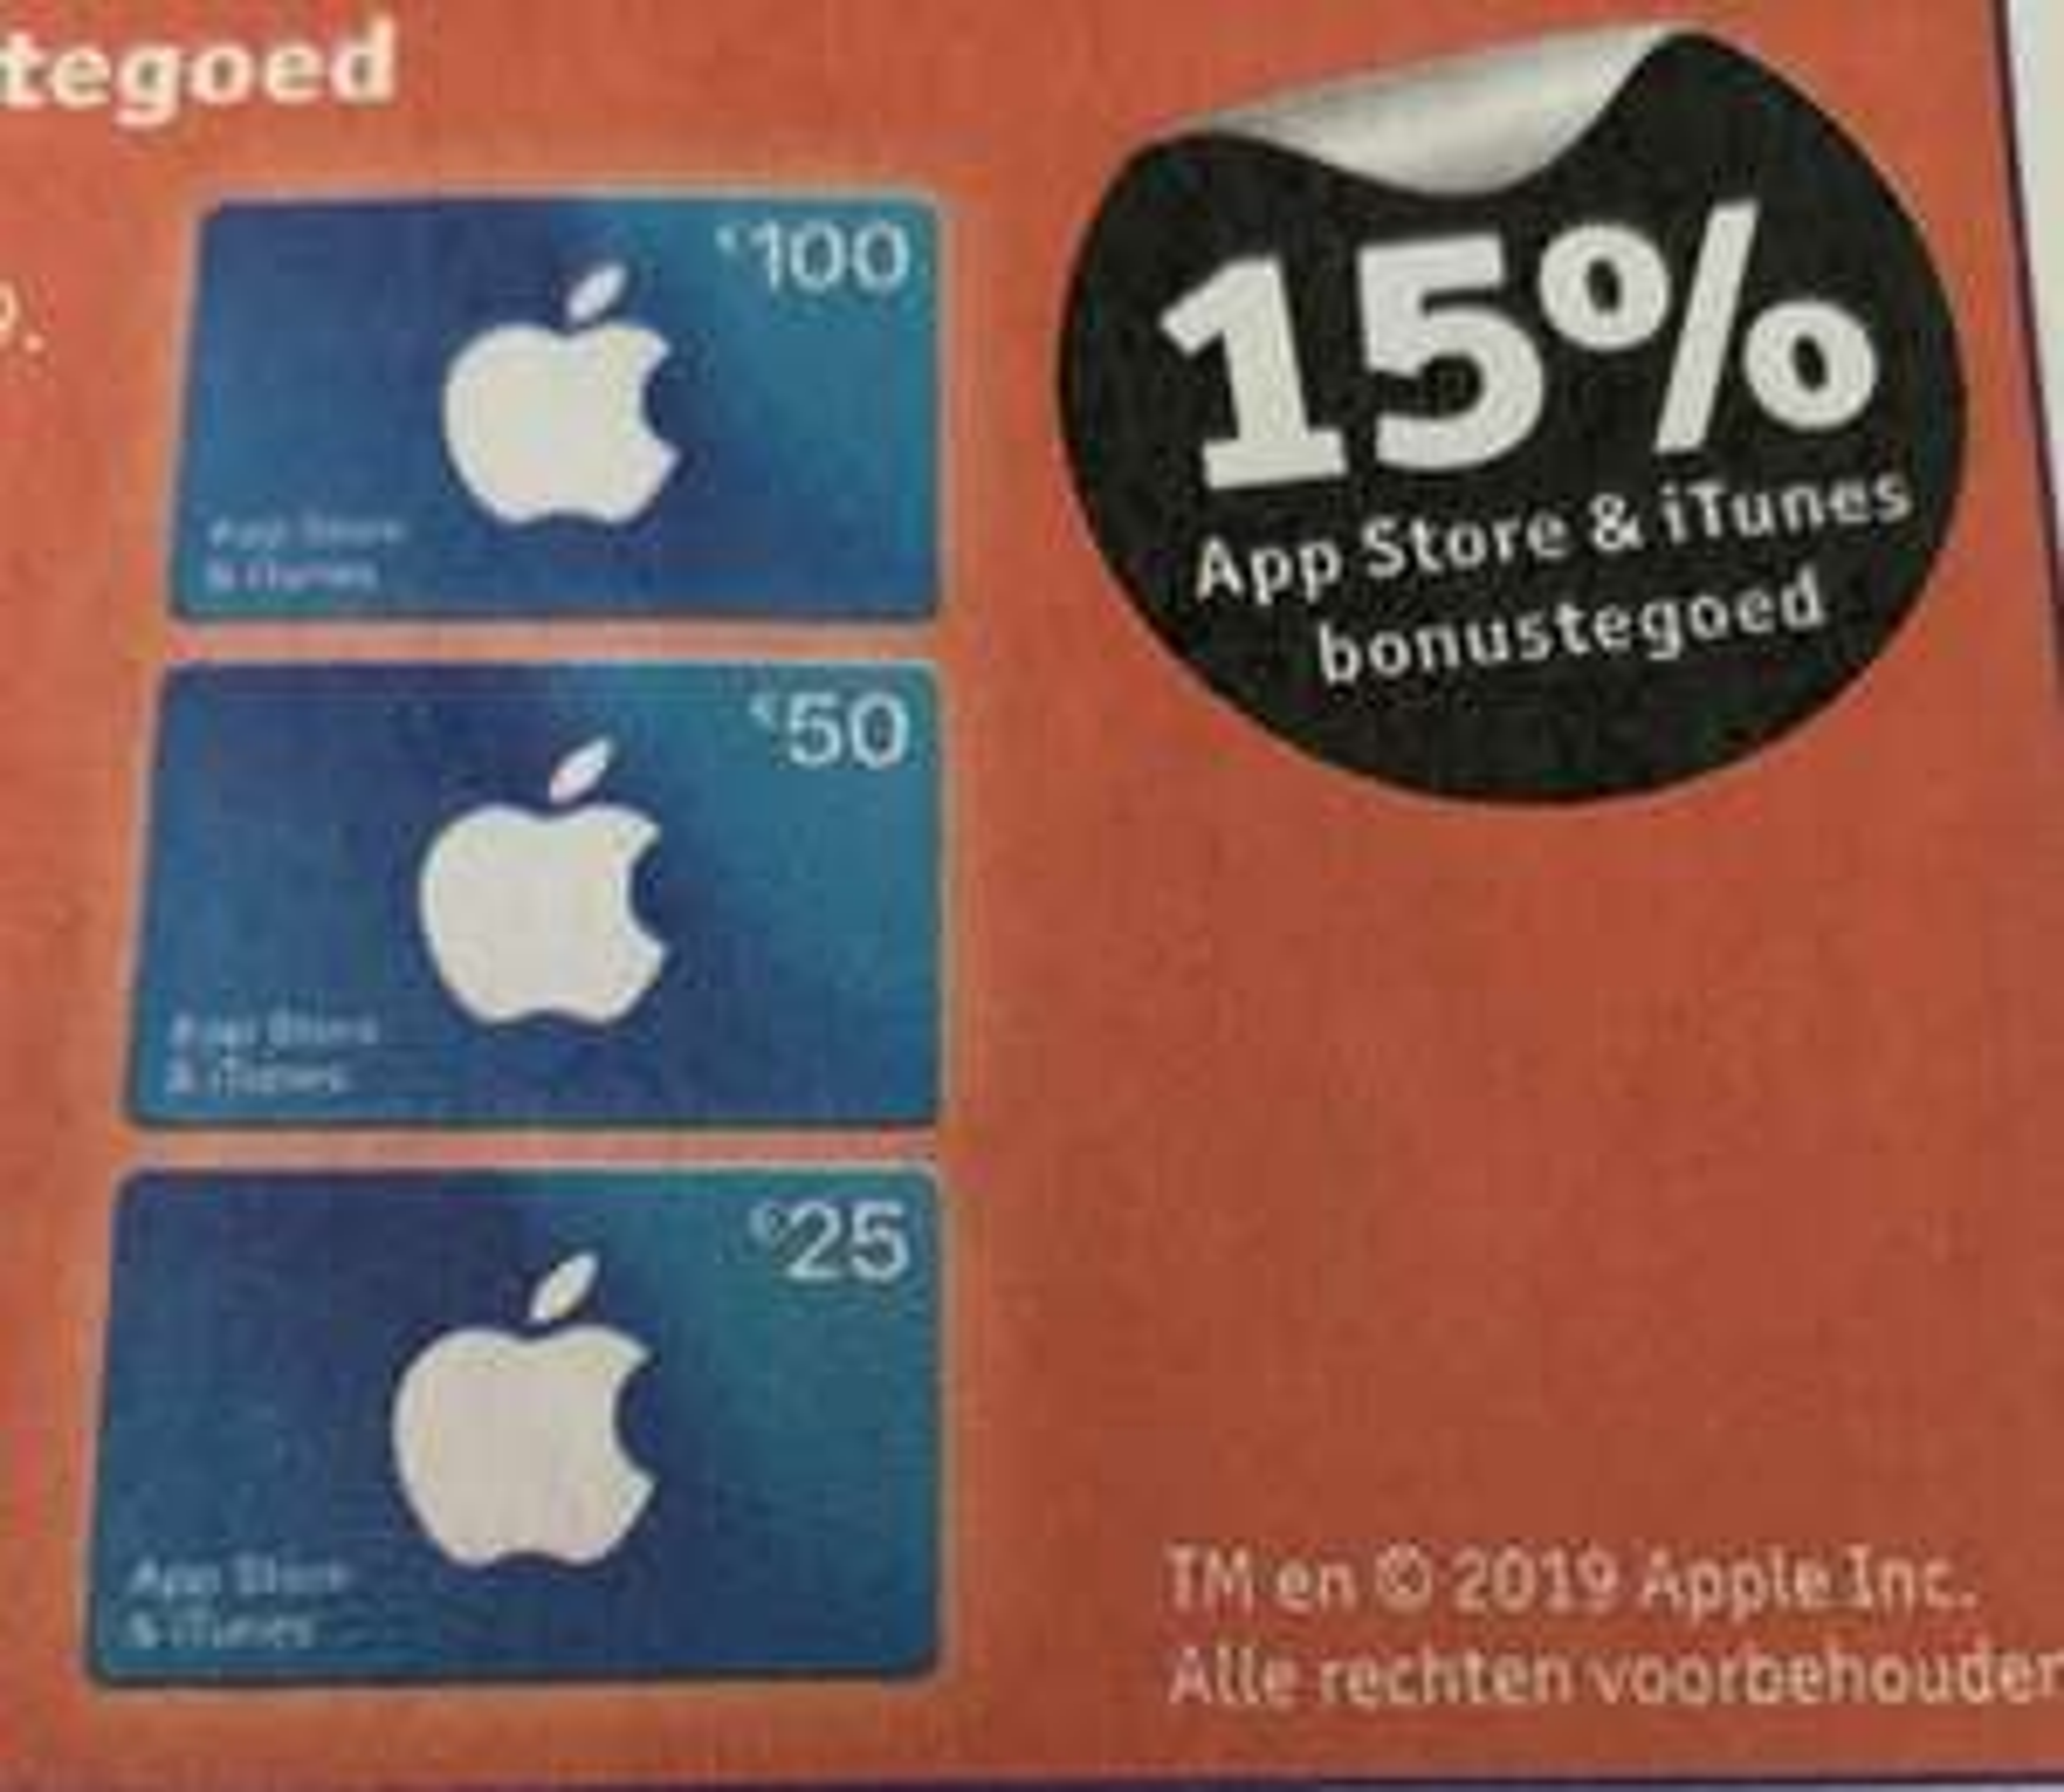 15% app store & iTunes bonustegoed